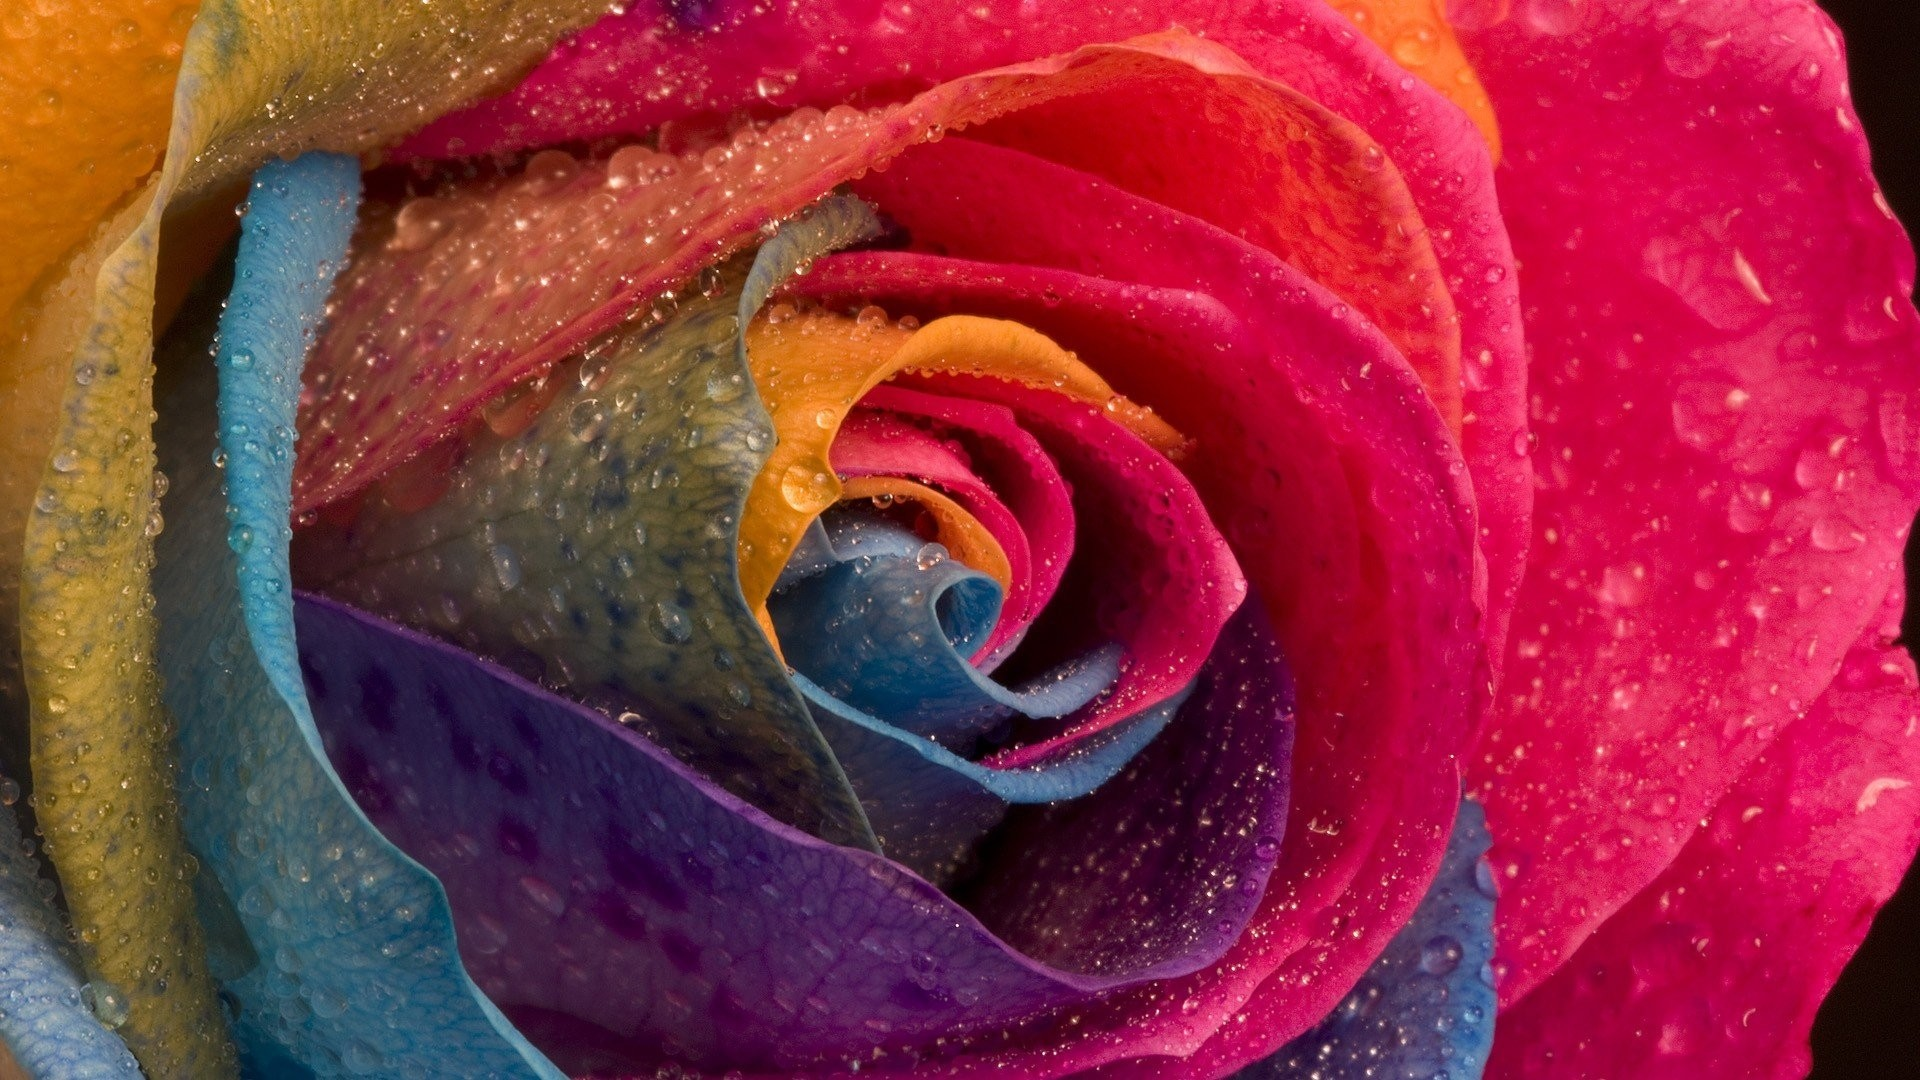 Rainbow Rose PC Wallpaper HD